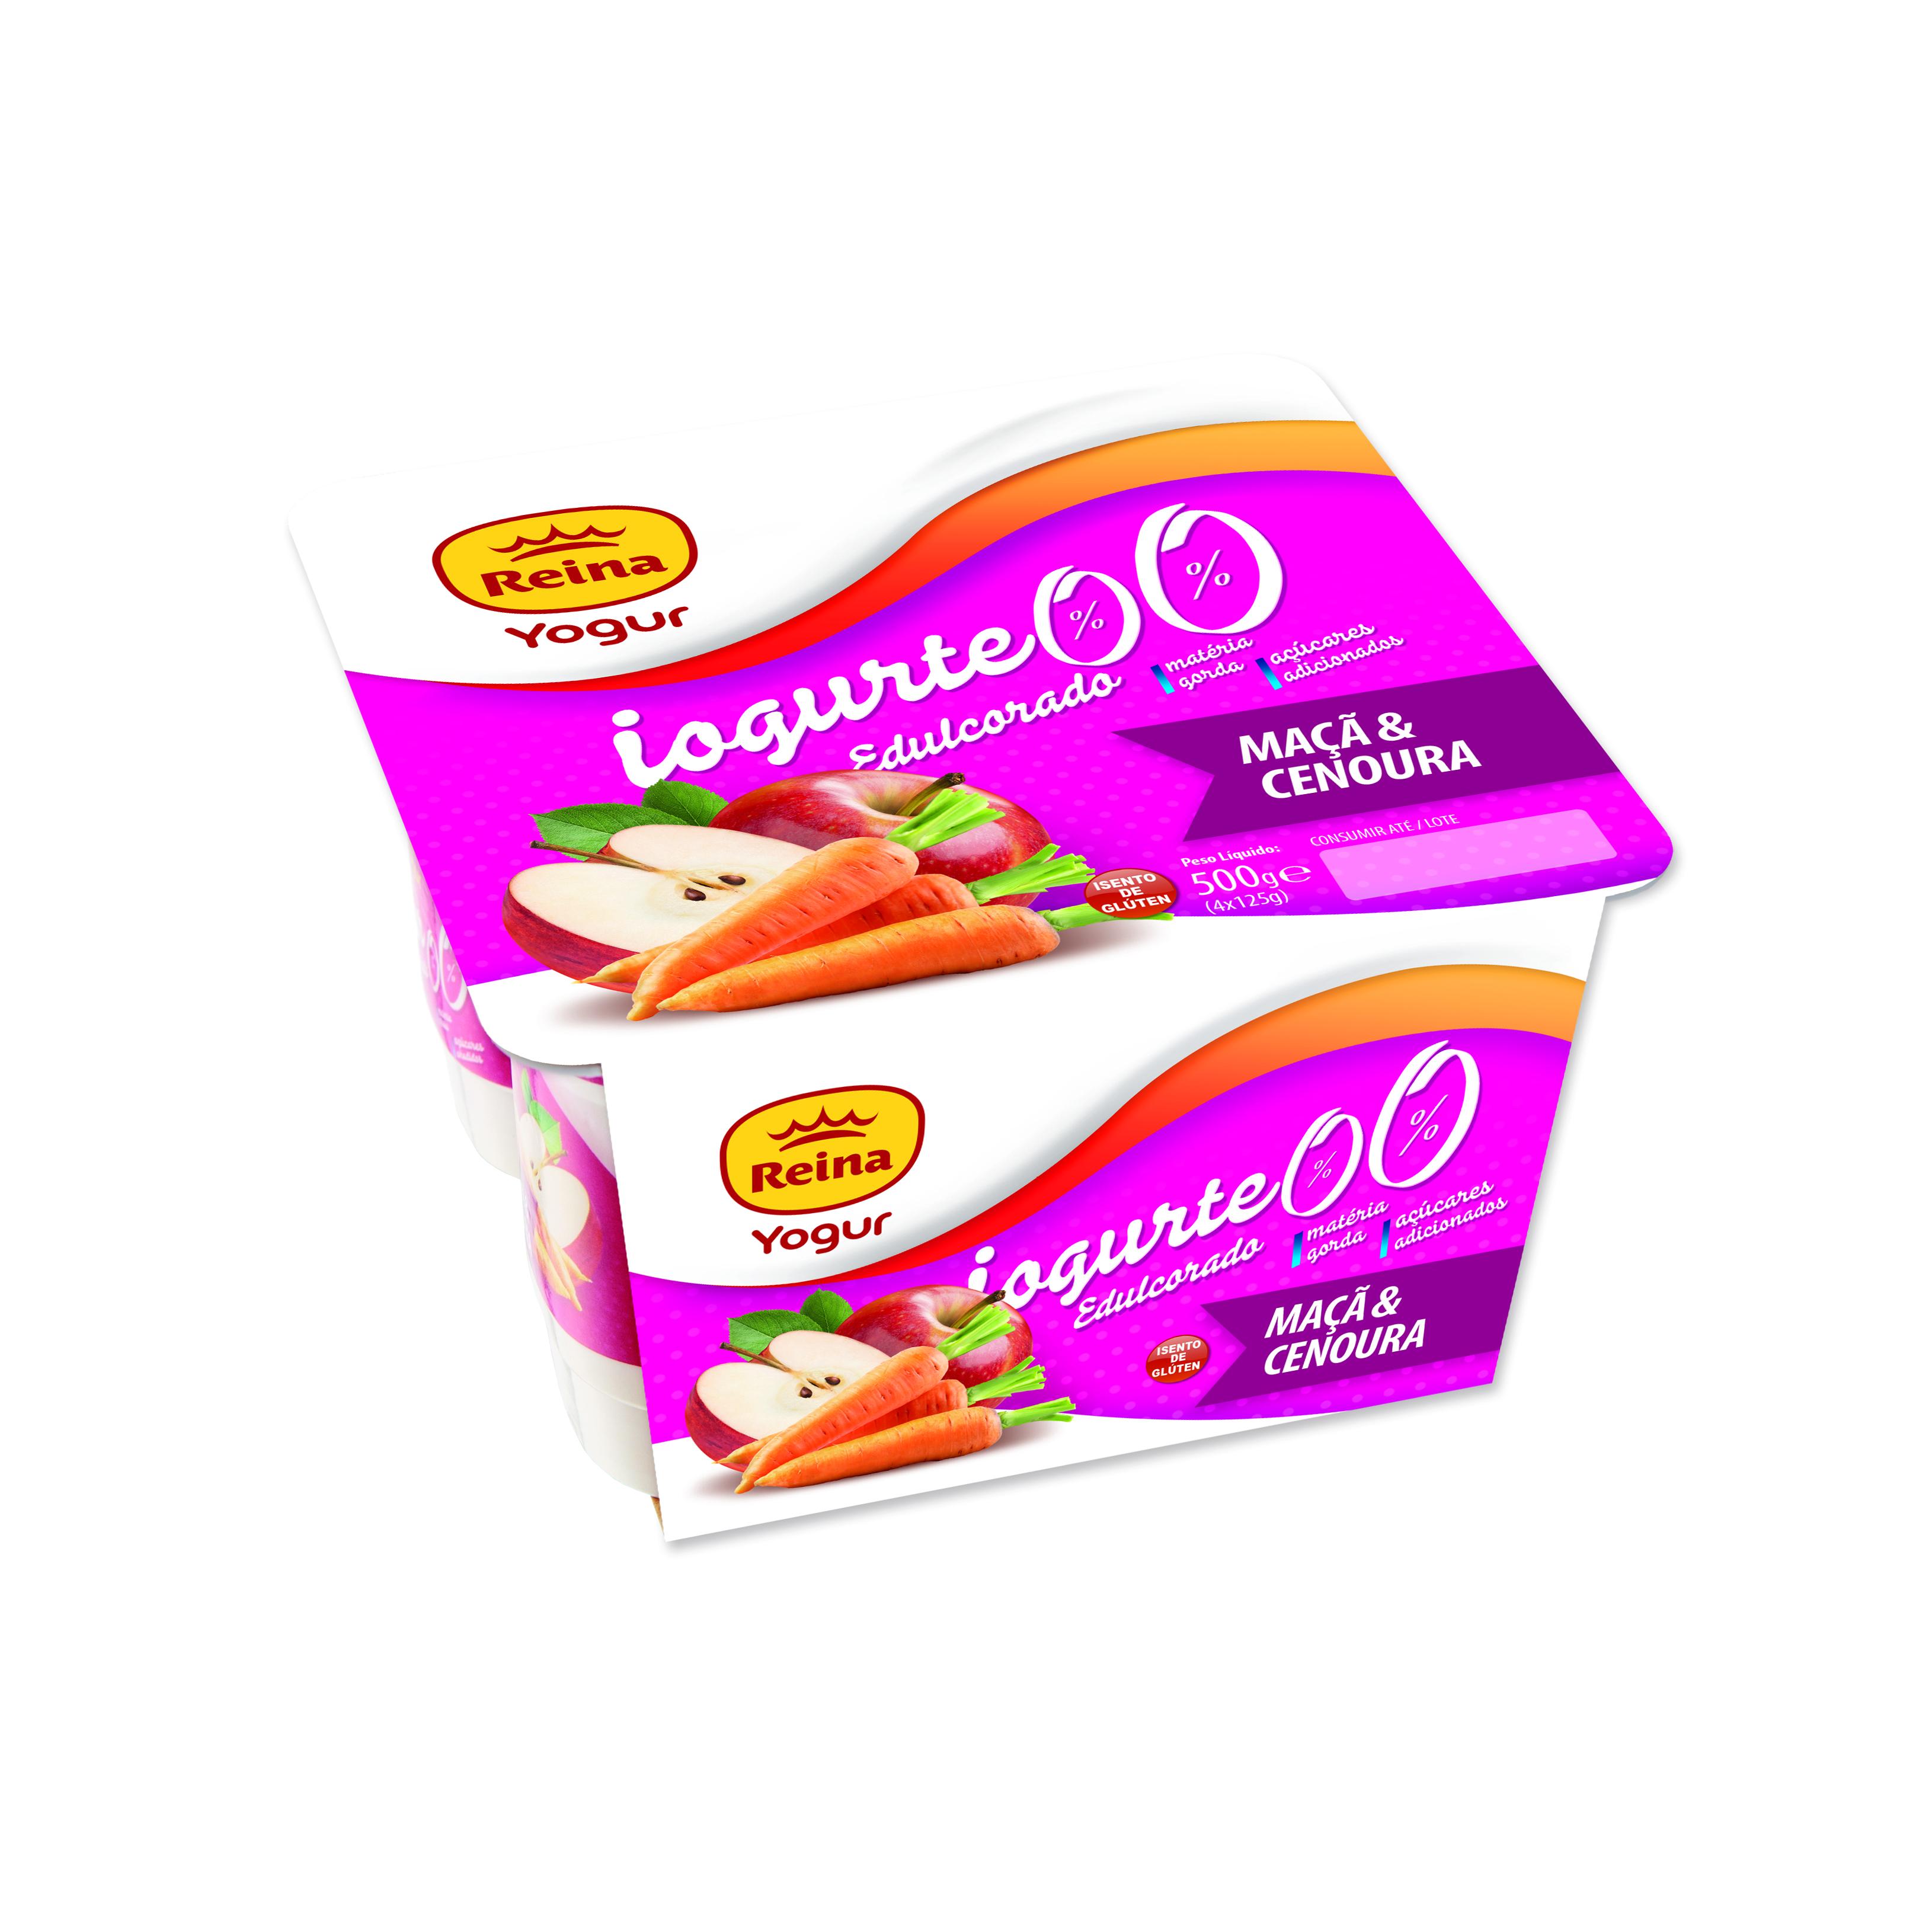 iogurte-magro-0-m-g-0-acucares-adicionados-edulcorado-maca-cenoura